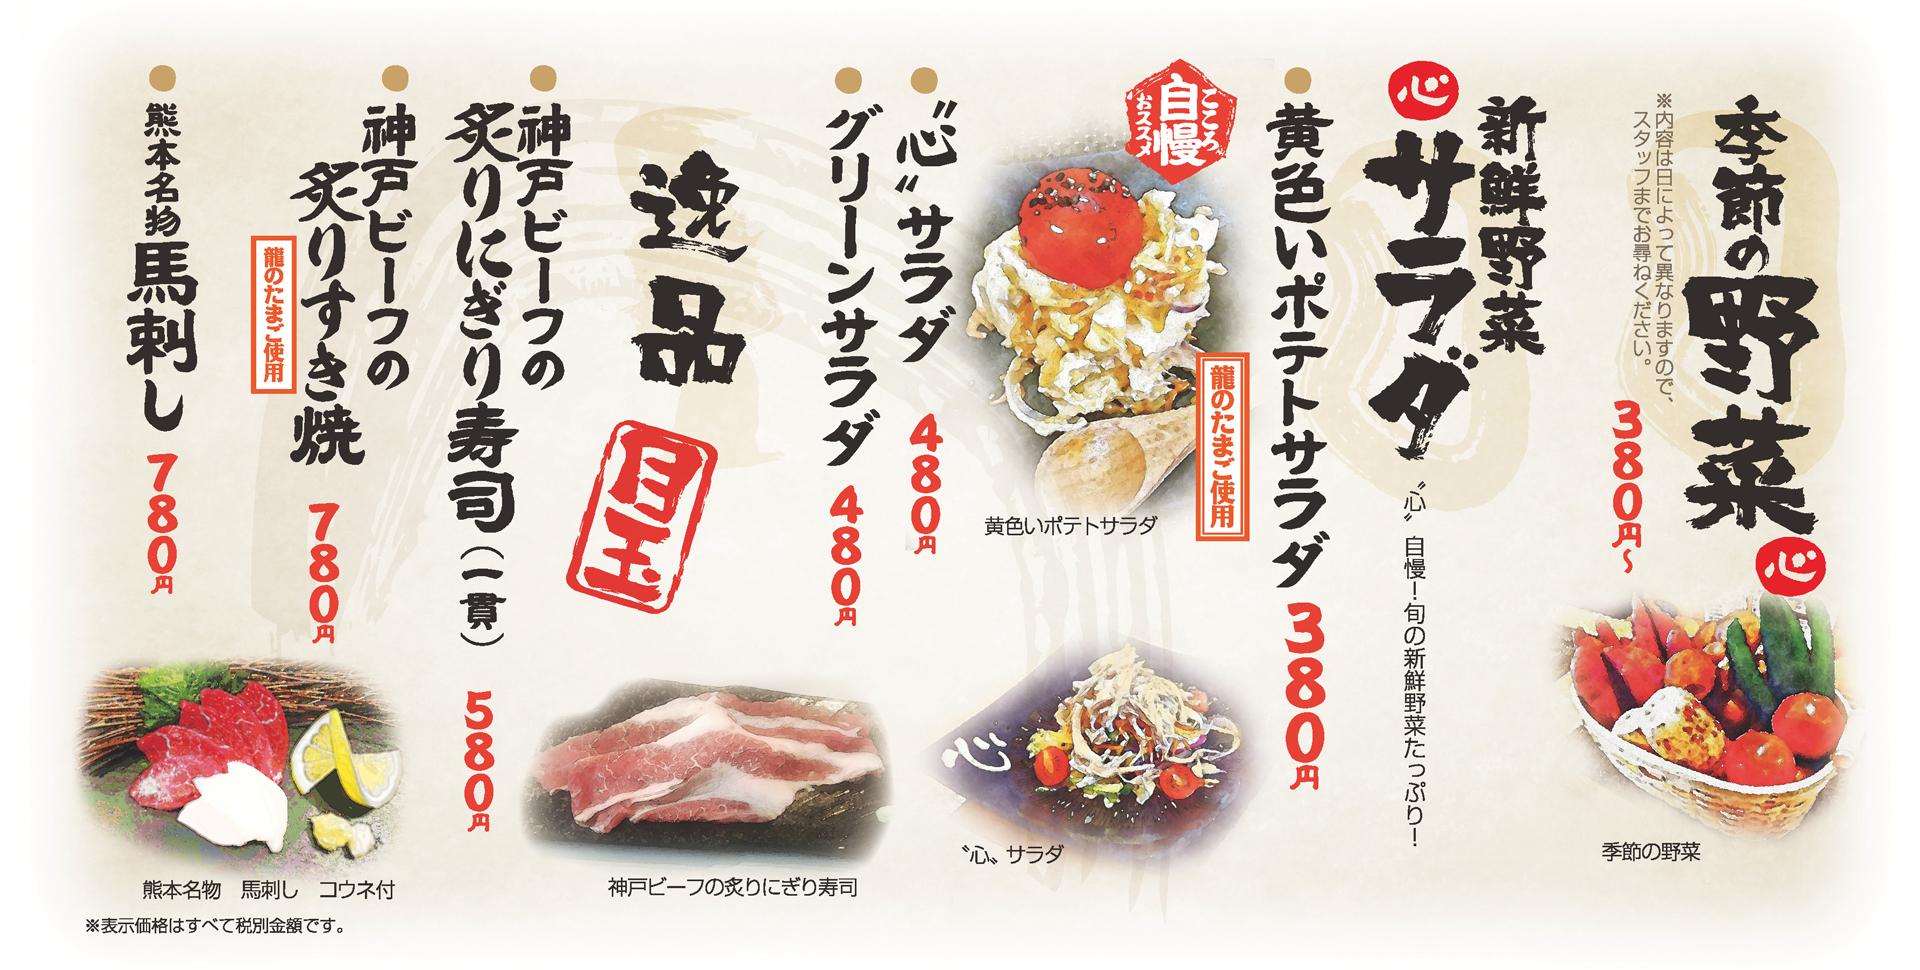 心八剣伝 季節の野菜・新鮮野菜サラダ・逸品